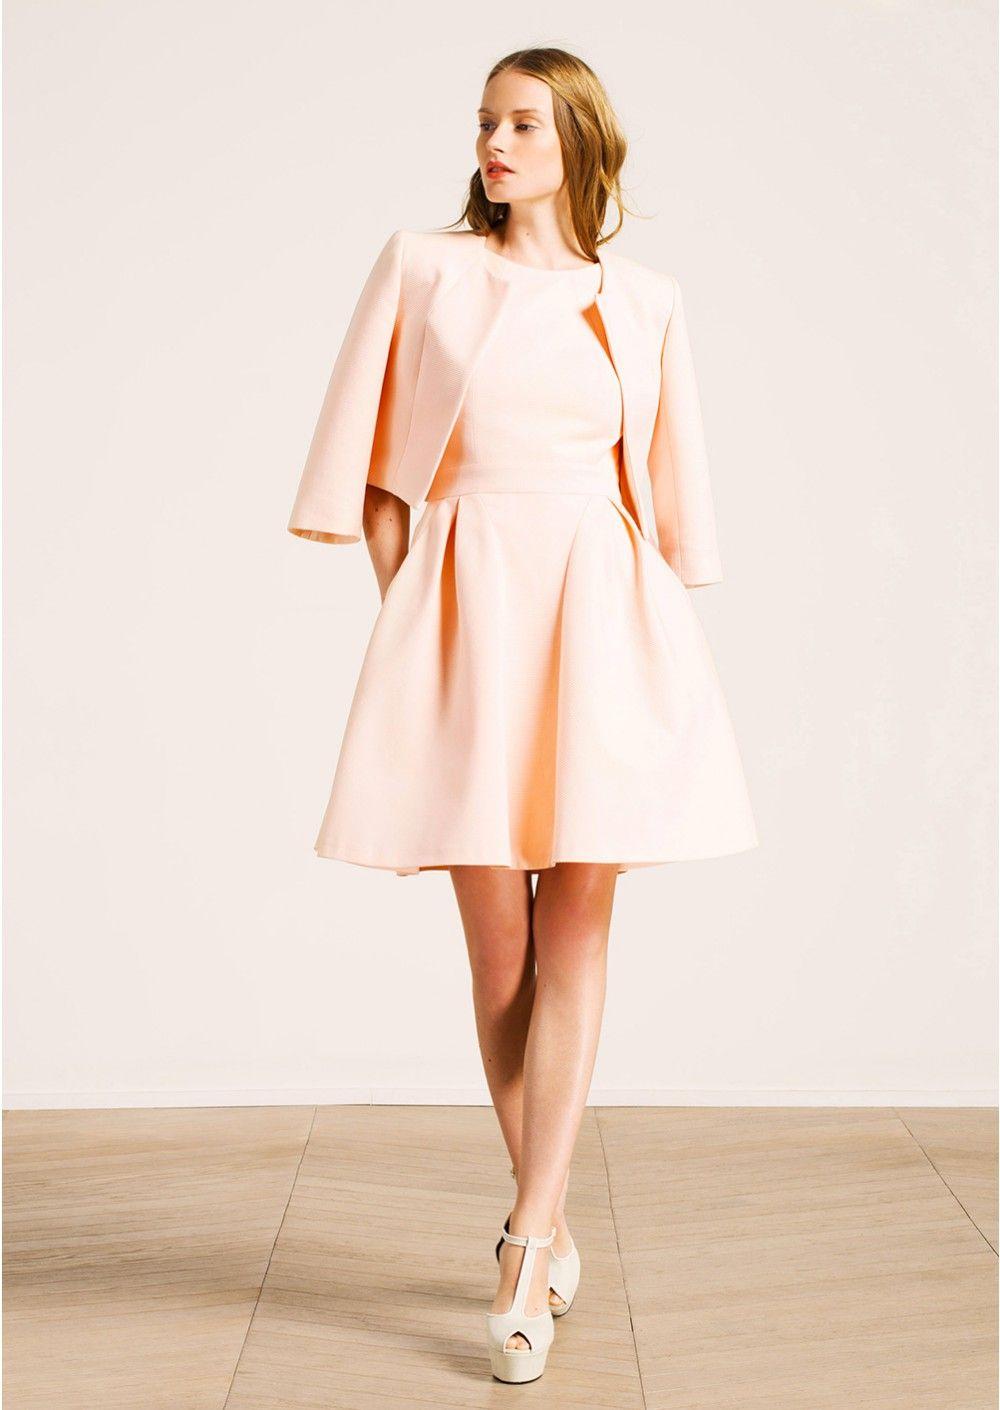 veste bol ro sans col et robe en ottoman rose femme tara jarmon 3 wedding guest veste. Black Bedroom Furniture Sets. Home Design Ideas